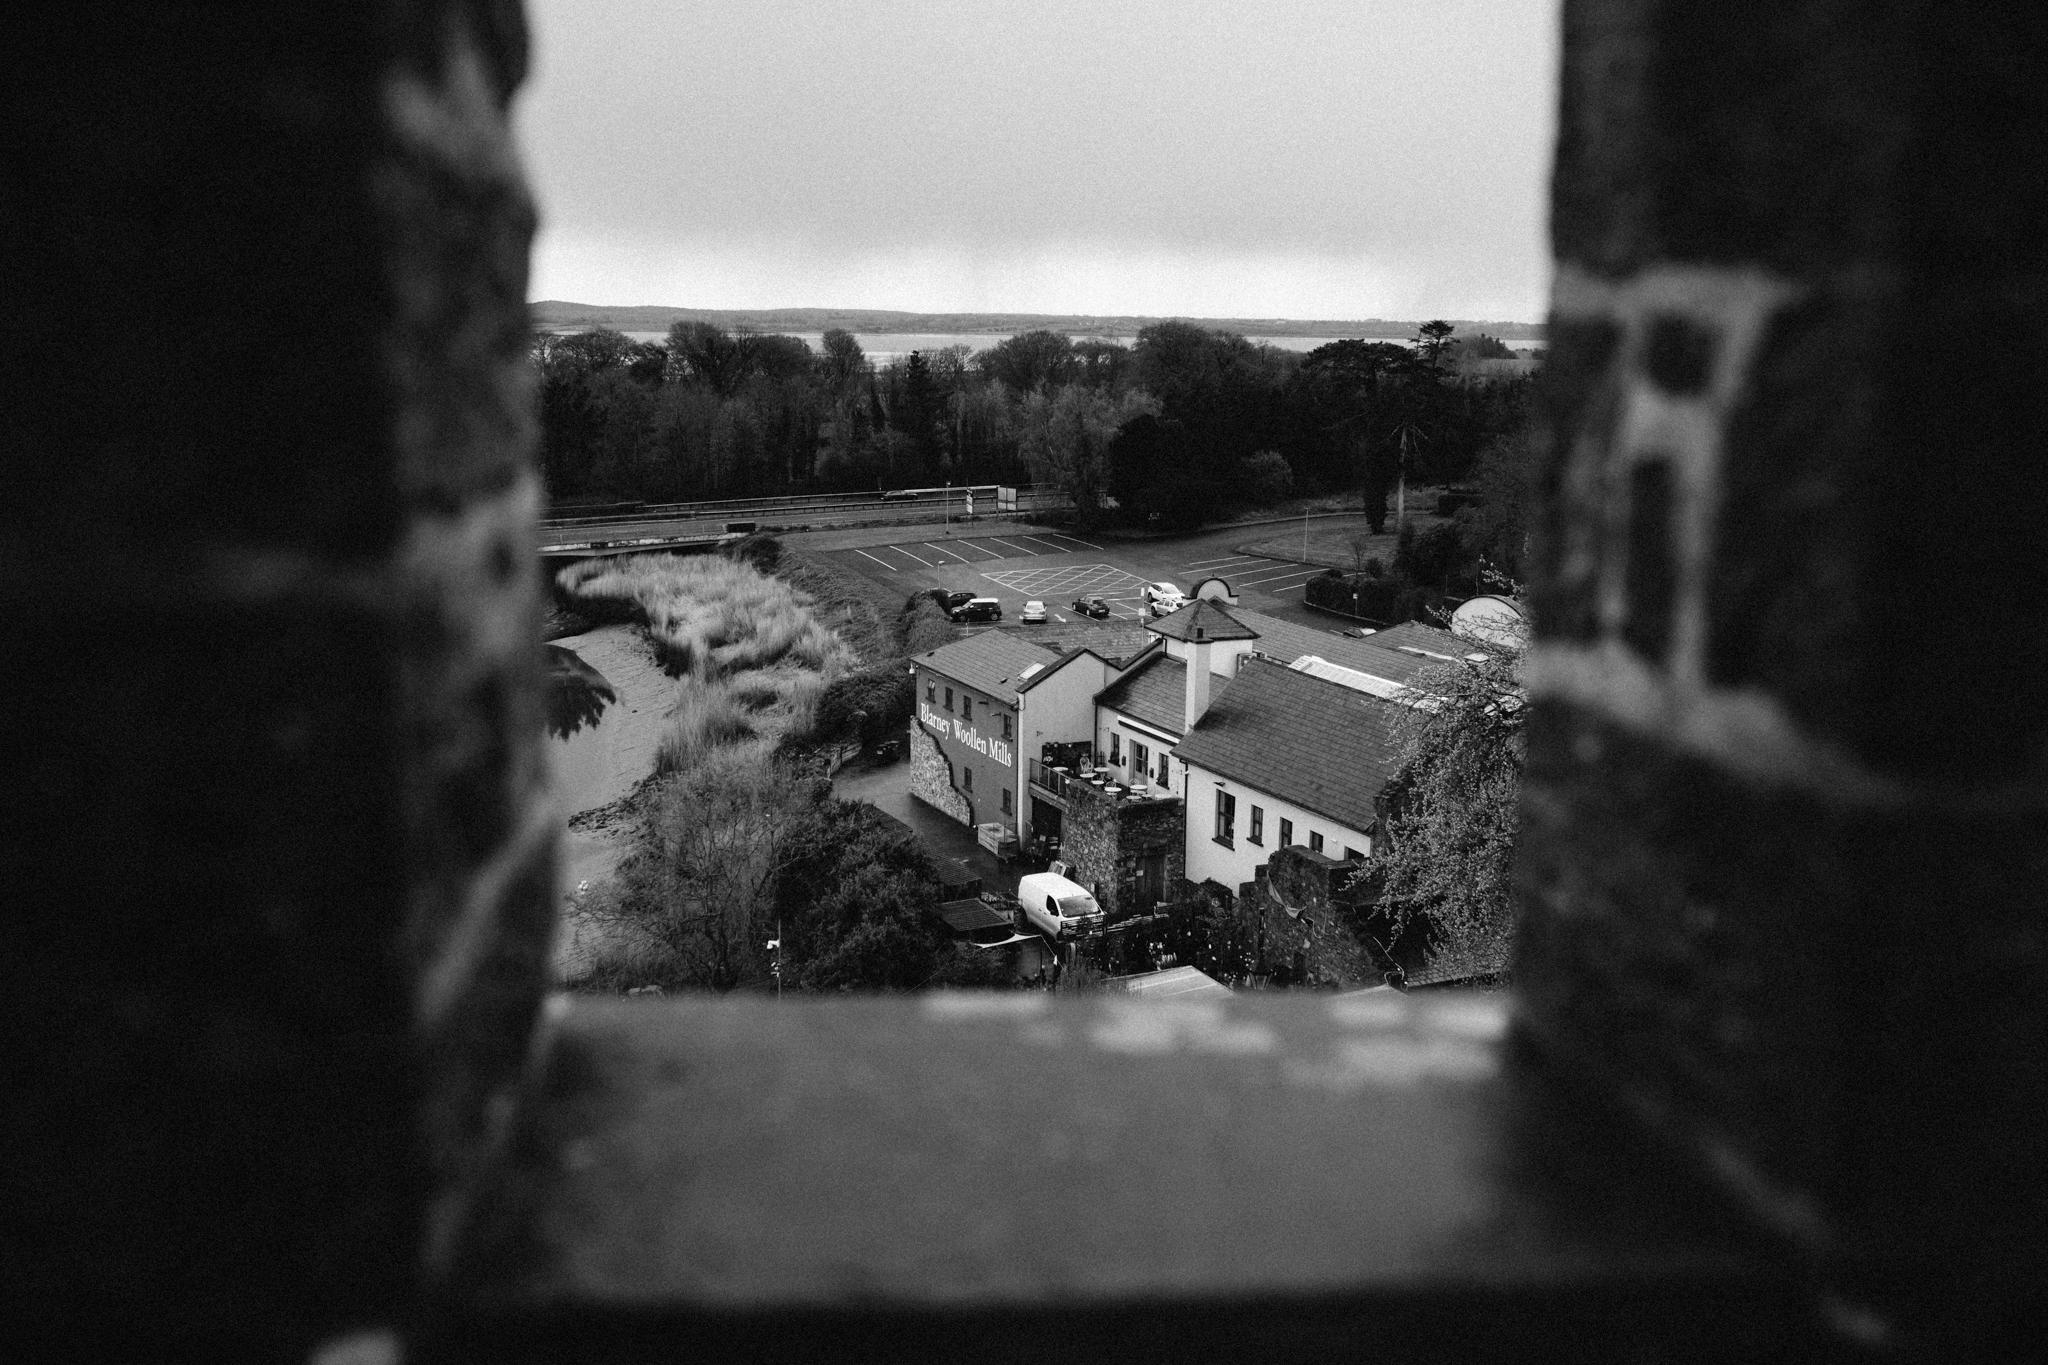 ireland_galway_dublin_rebecca_burt_photography-27.jpg